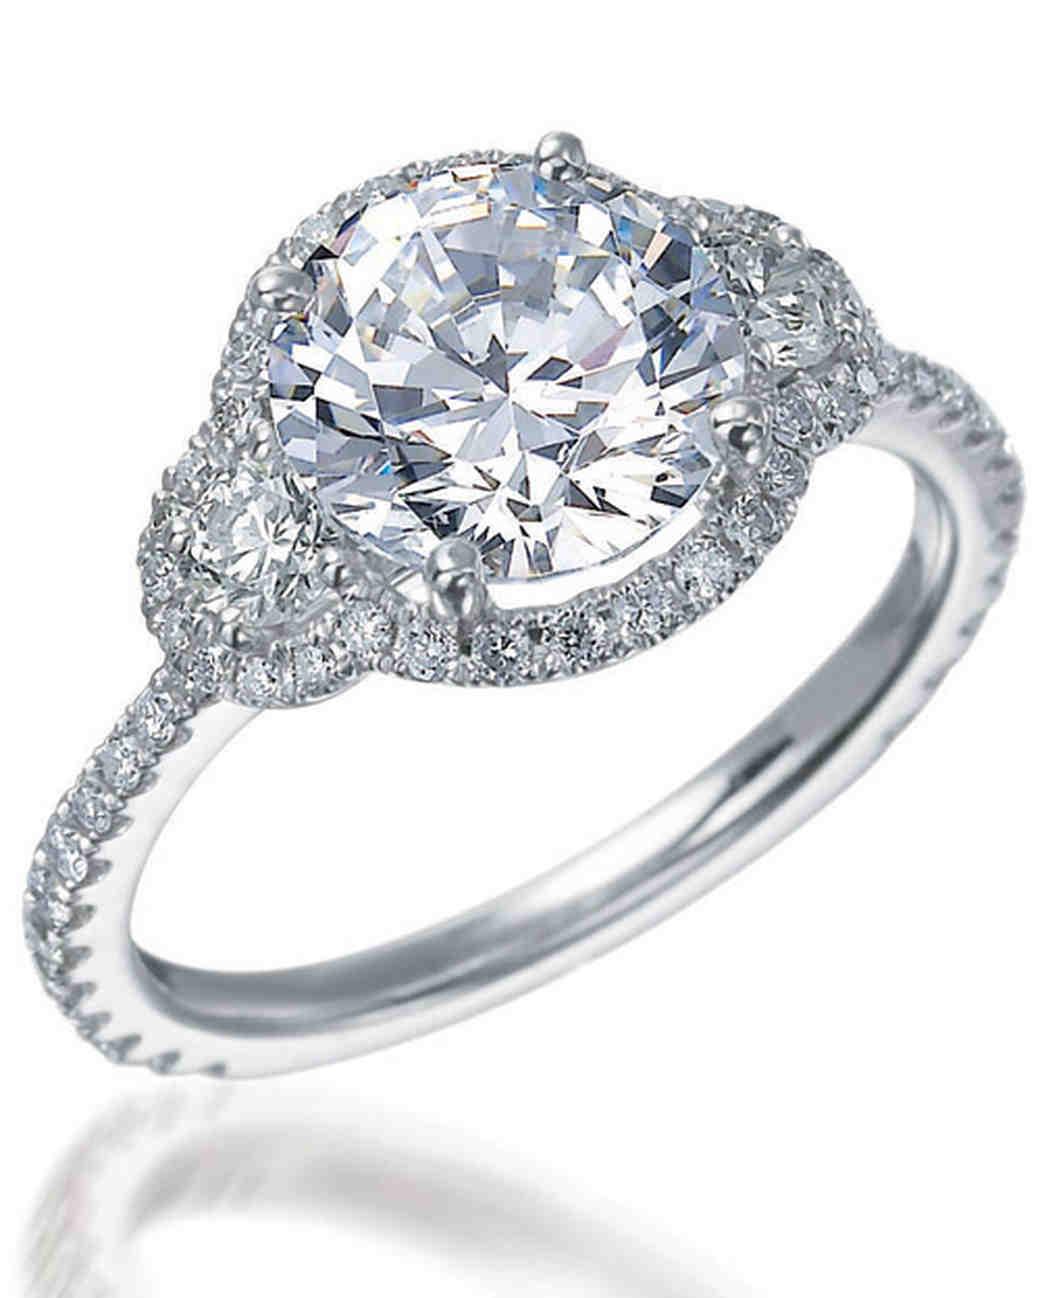 Round-Cut Diamond Engagement Rings | Martha Stewart Weddings